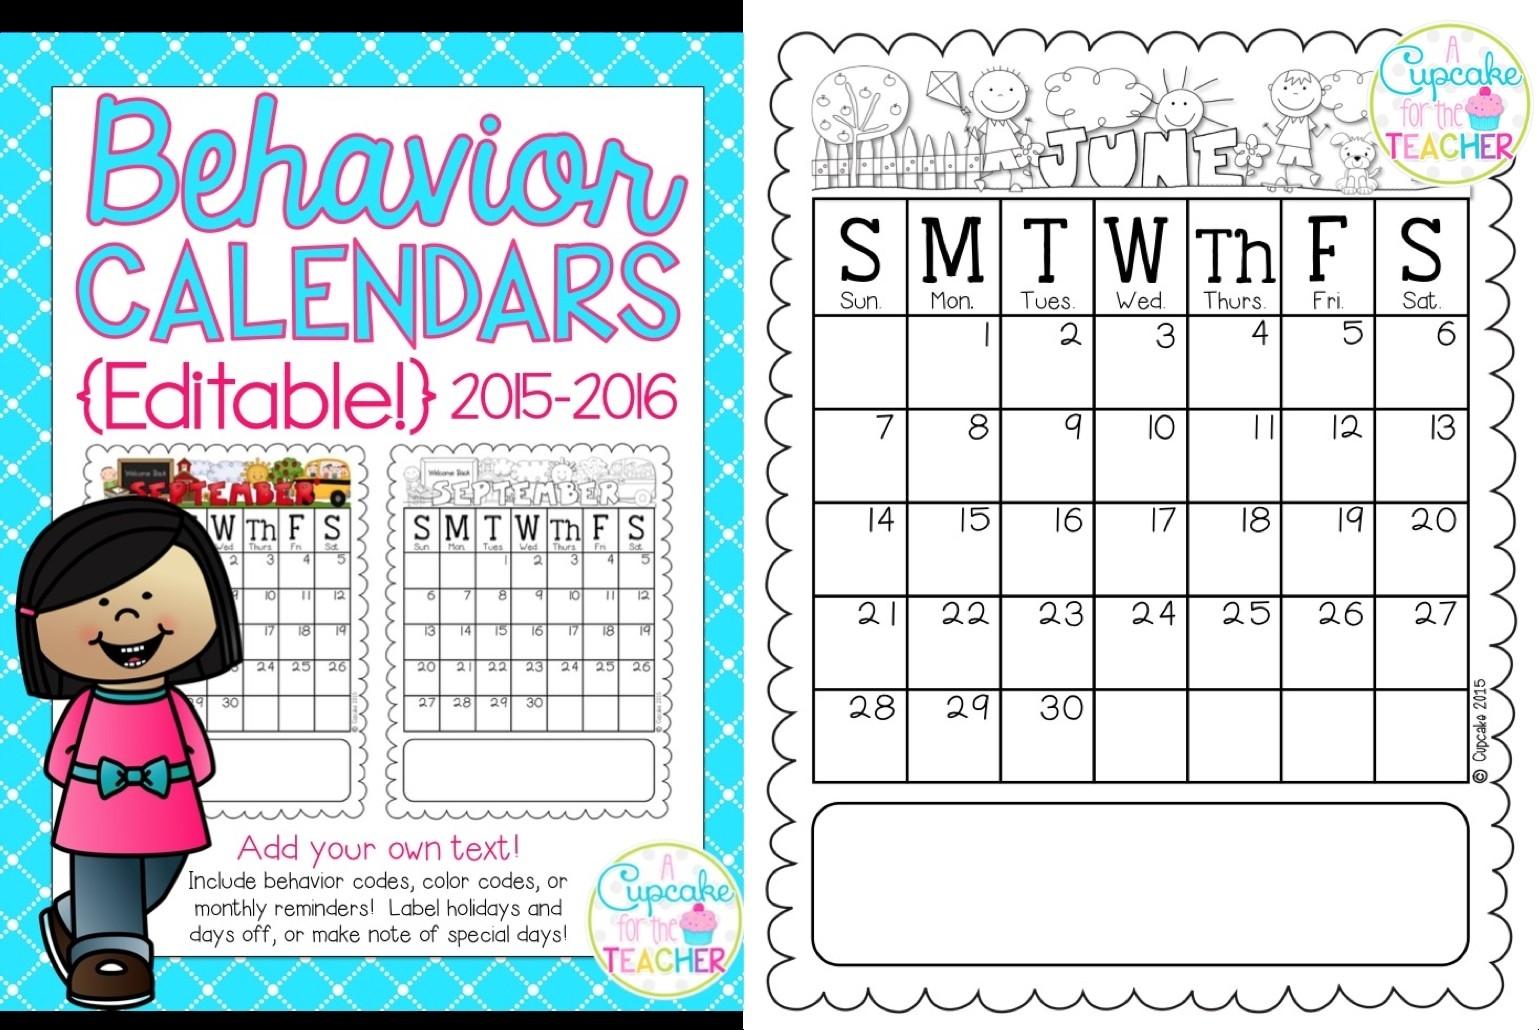 Monthly Behavior Calendar Template - Free Calendar Collection-Monthly Behavior Calendar Template